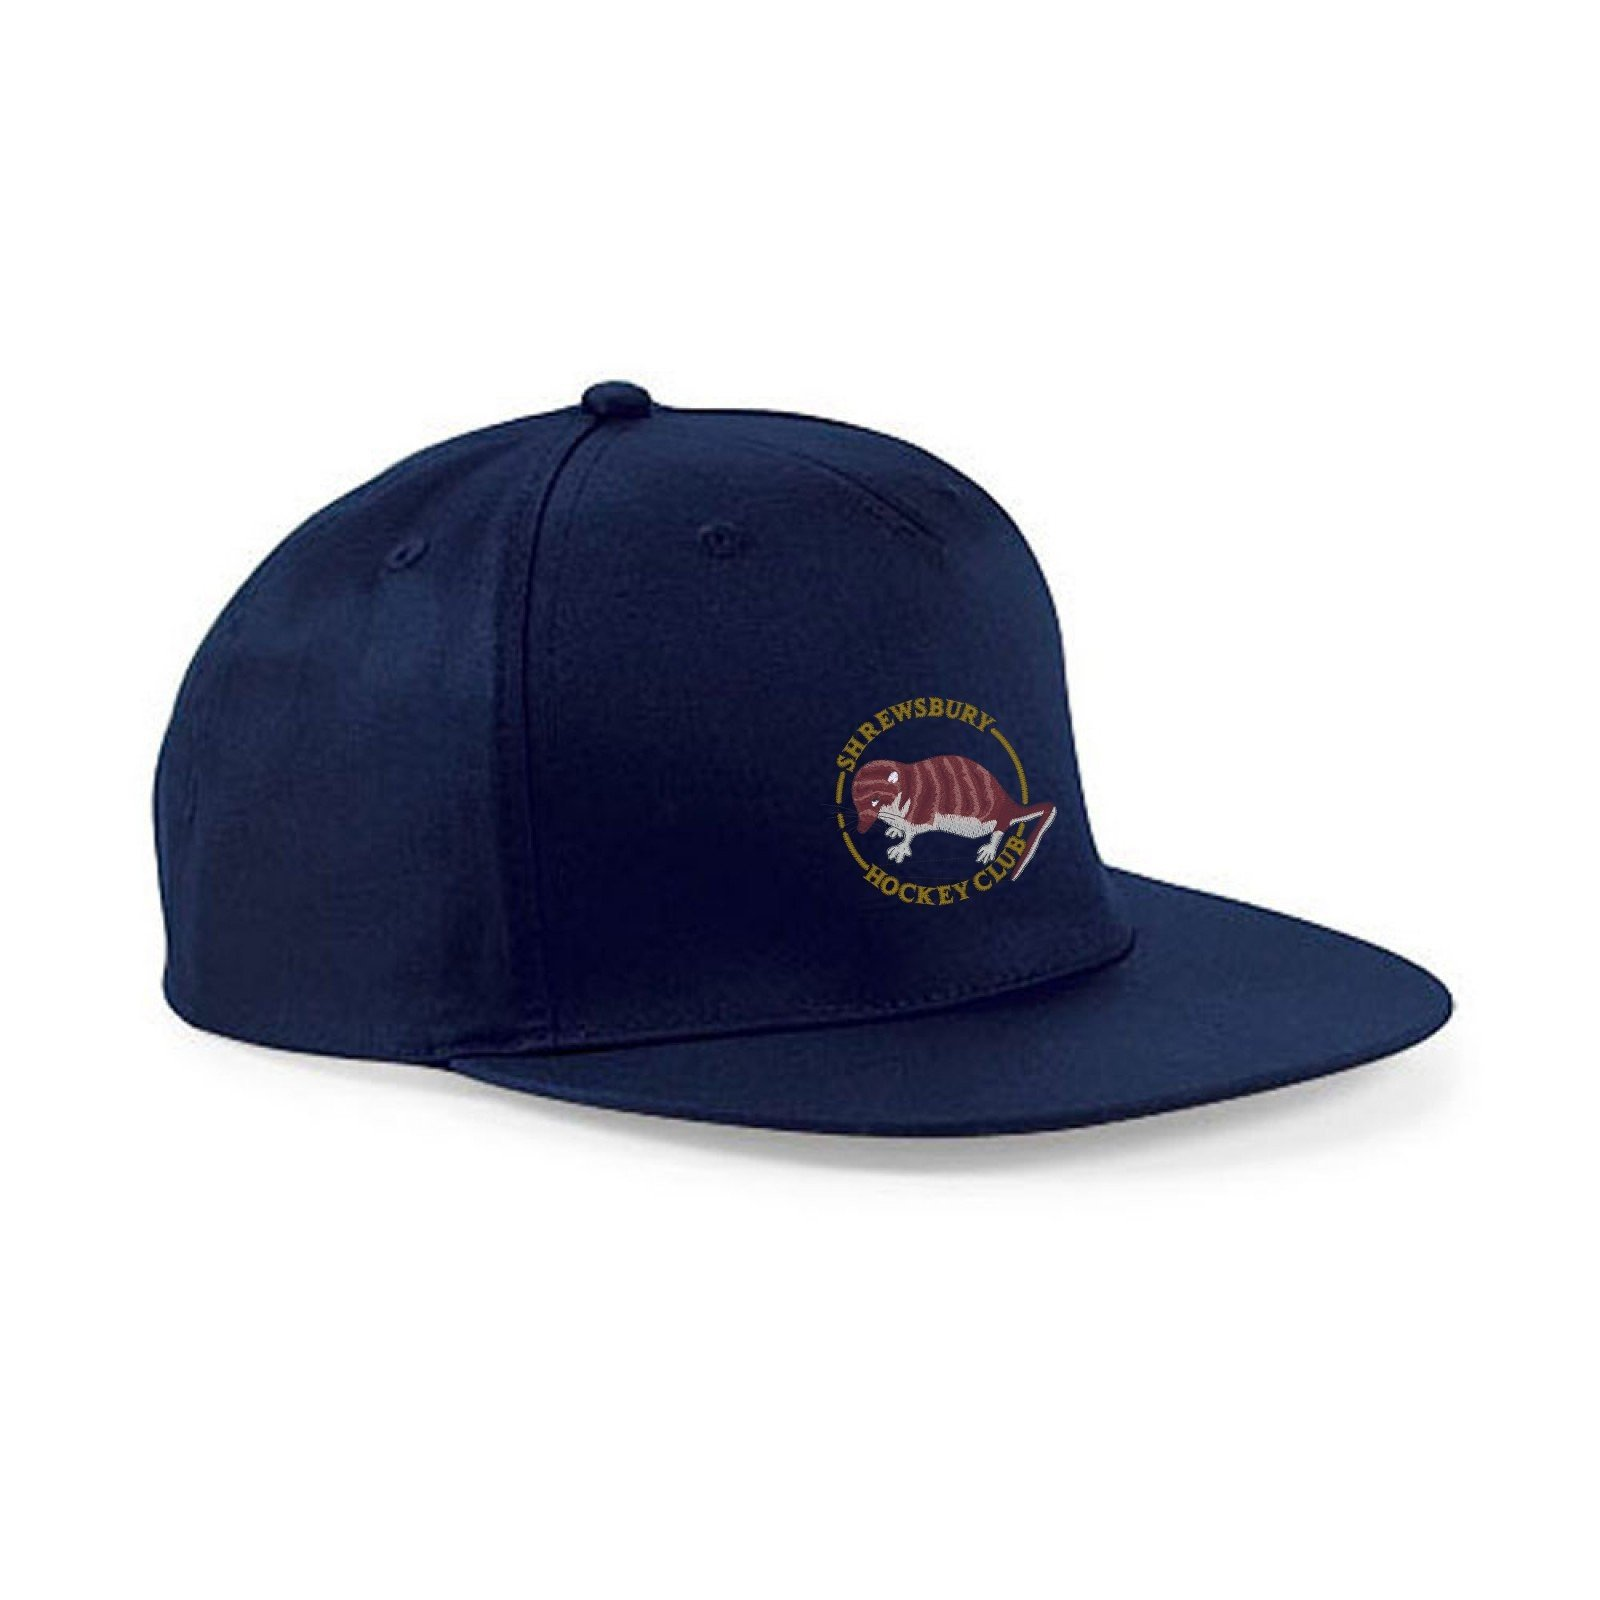 Shrewsbury Hockey Club Adidas Navy Snapback Hat